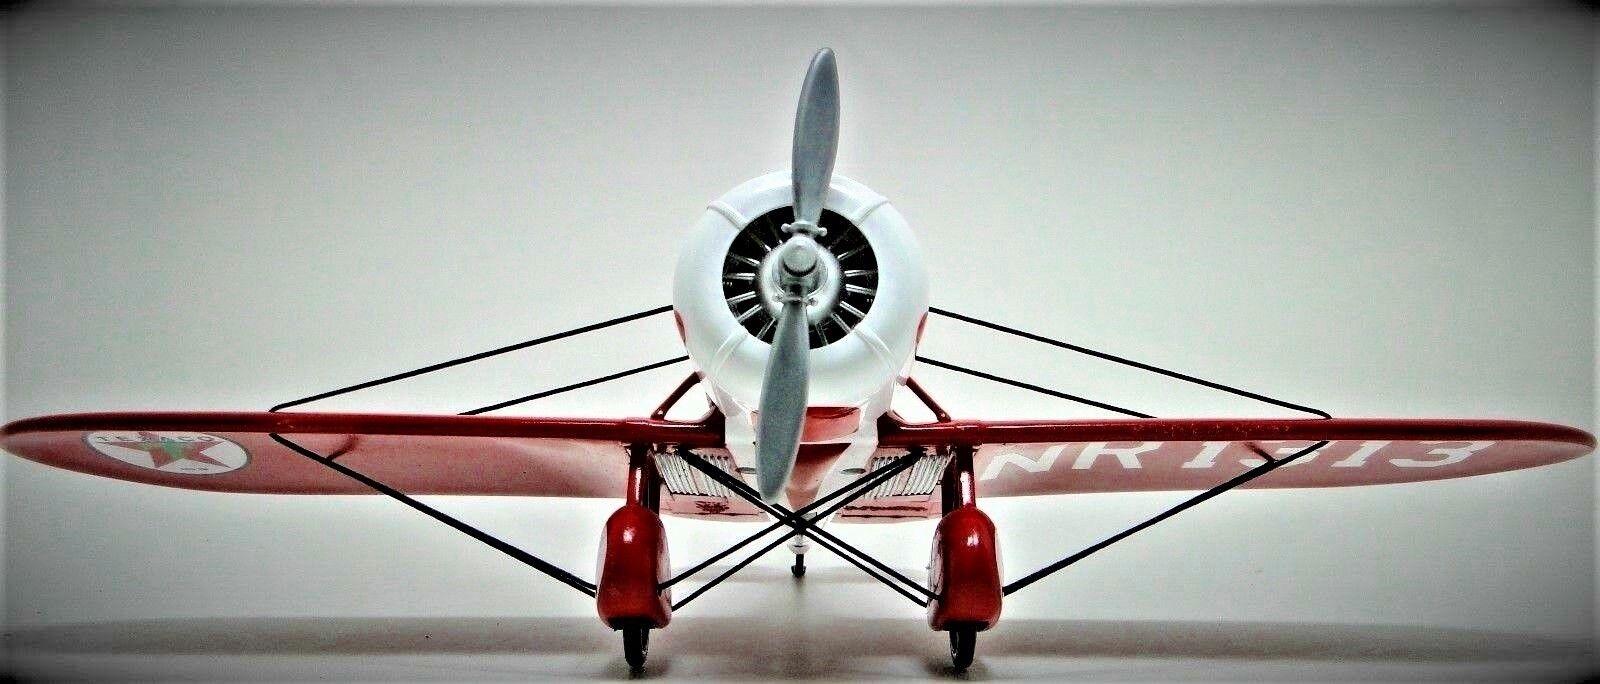 Modelo de avión aeronave Fighter nos Diecast armadura militar Segunda Guerra Mundial carrusel de 1 48 rosso